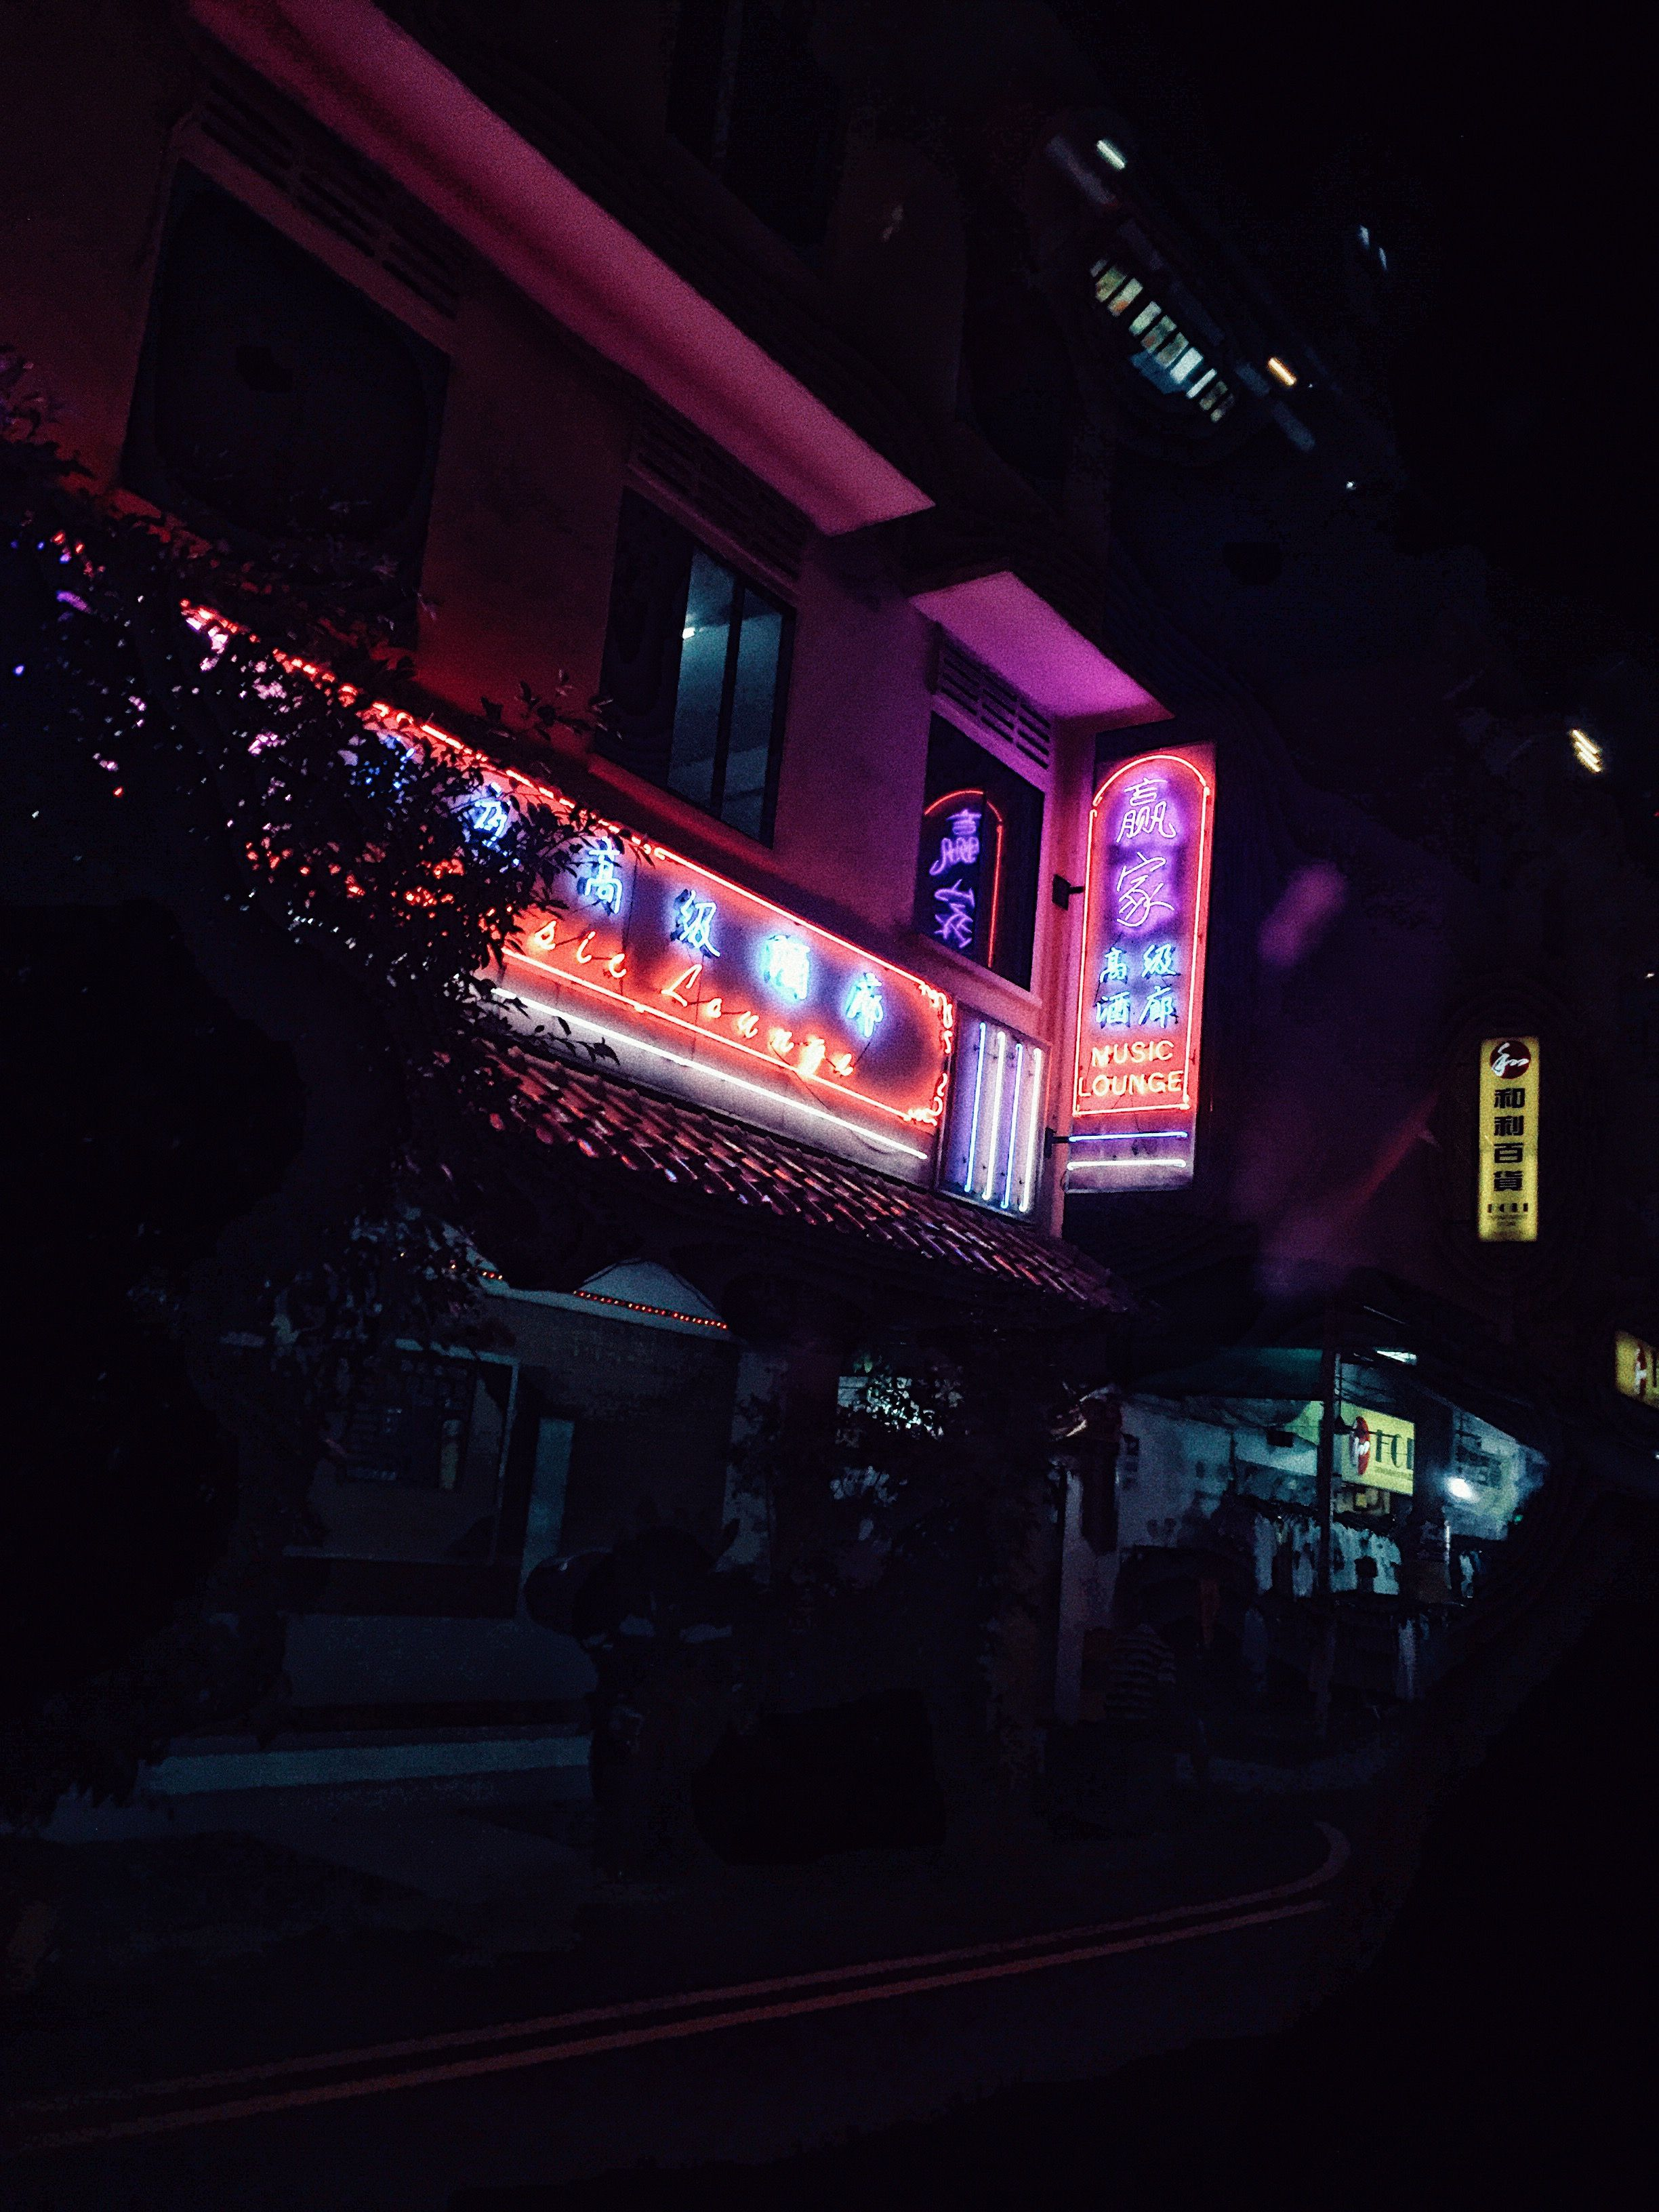 Pin by Jason Gelchen on Masashi Wakui Broadway shows